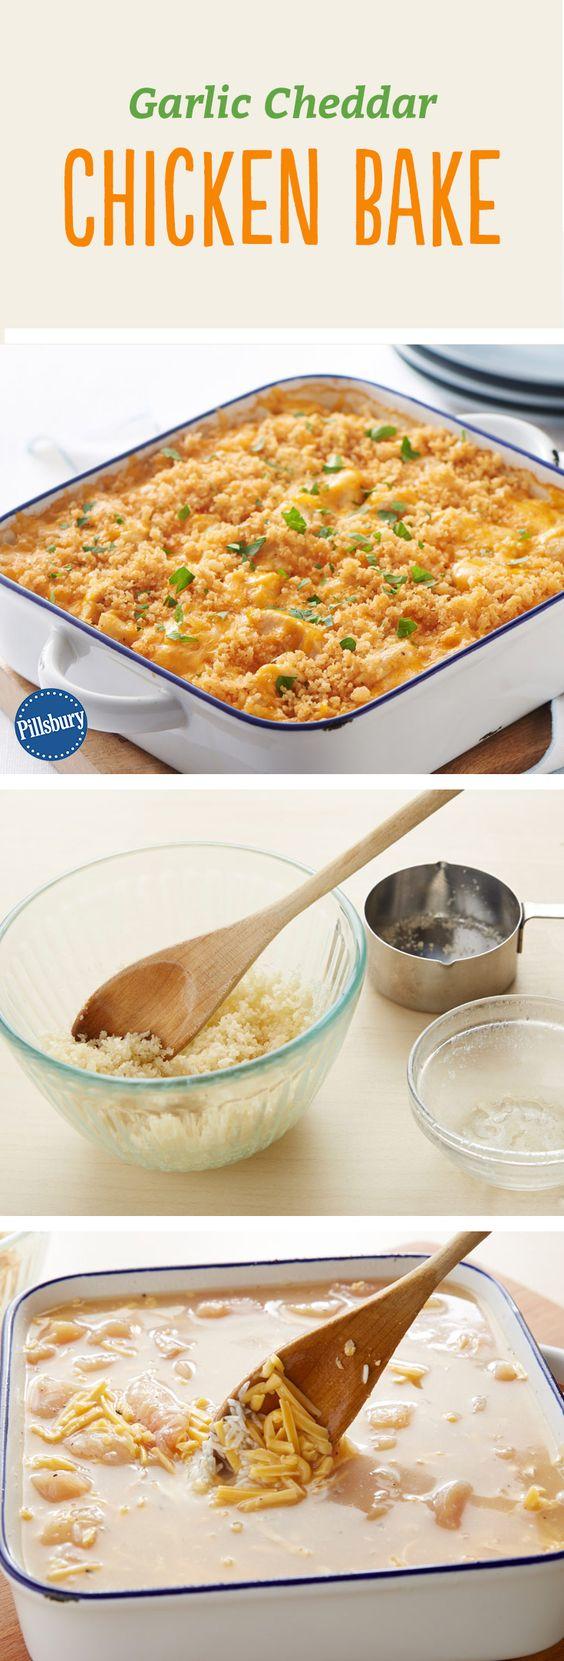 Garlic Cheddar Chicken Bake   Recipe   Cheesy Rice ...